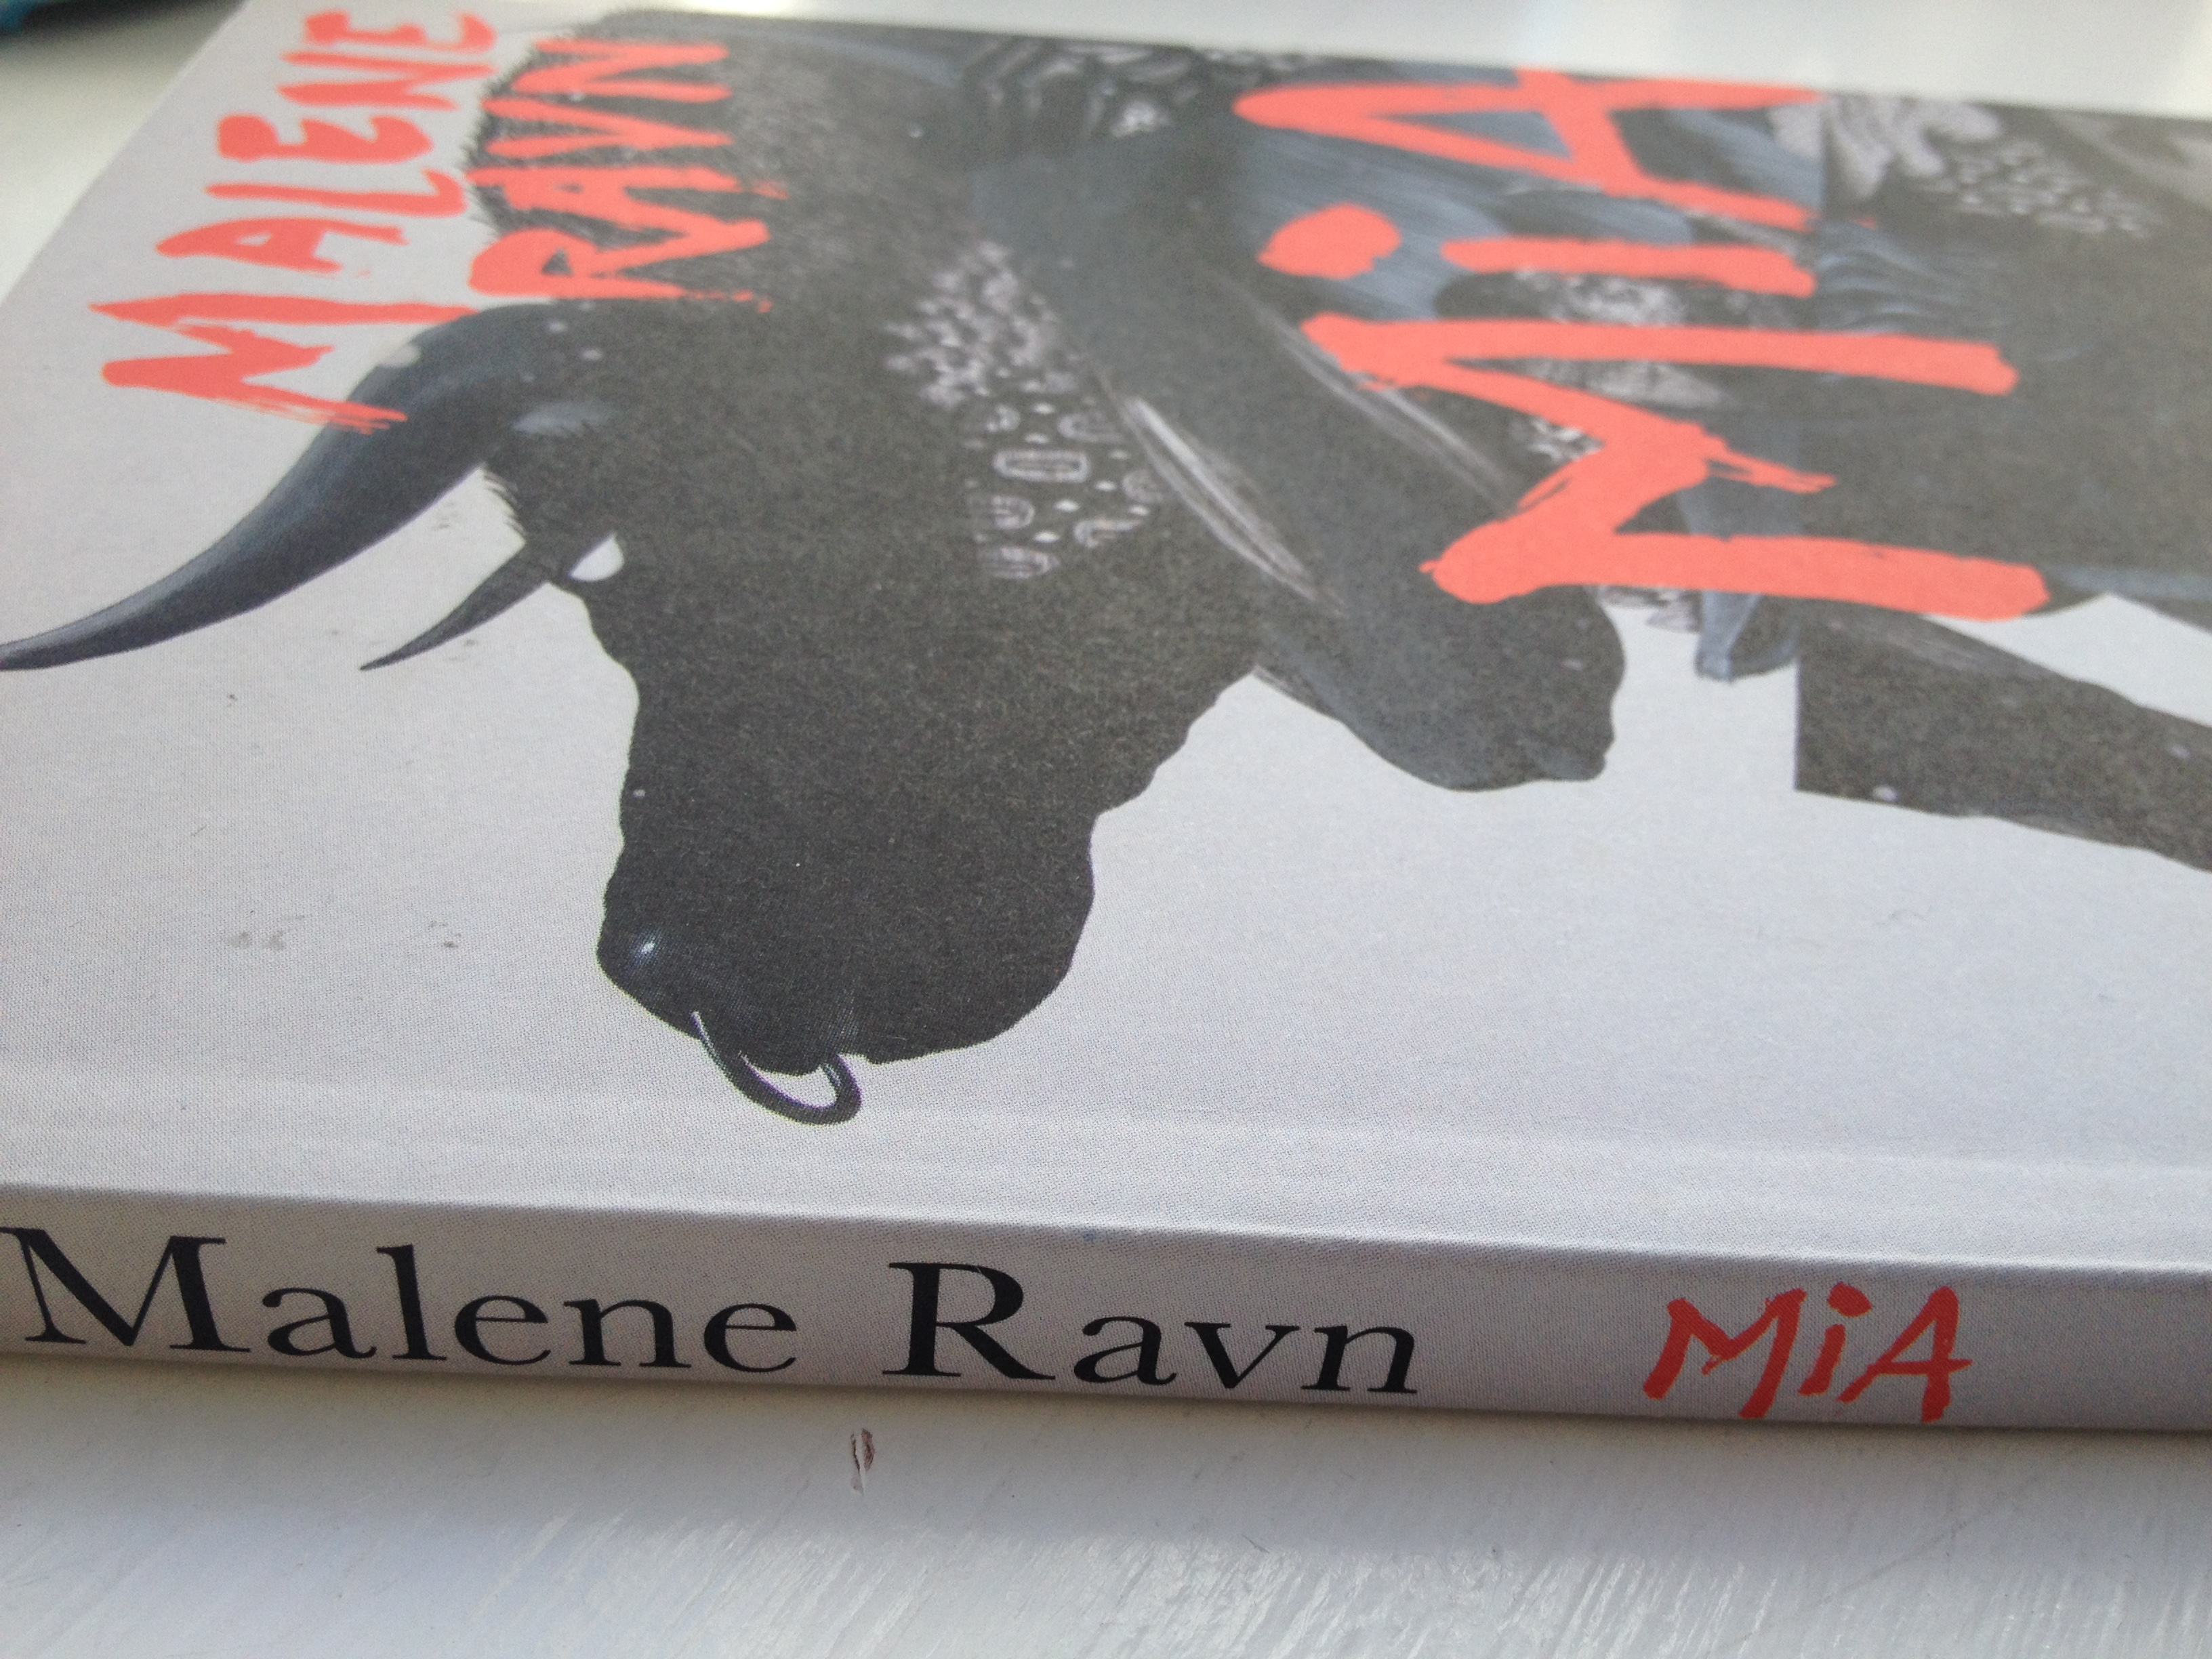 Malene Ravn roman